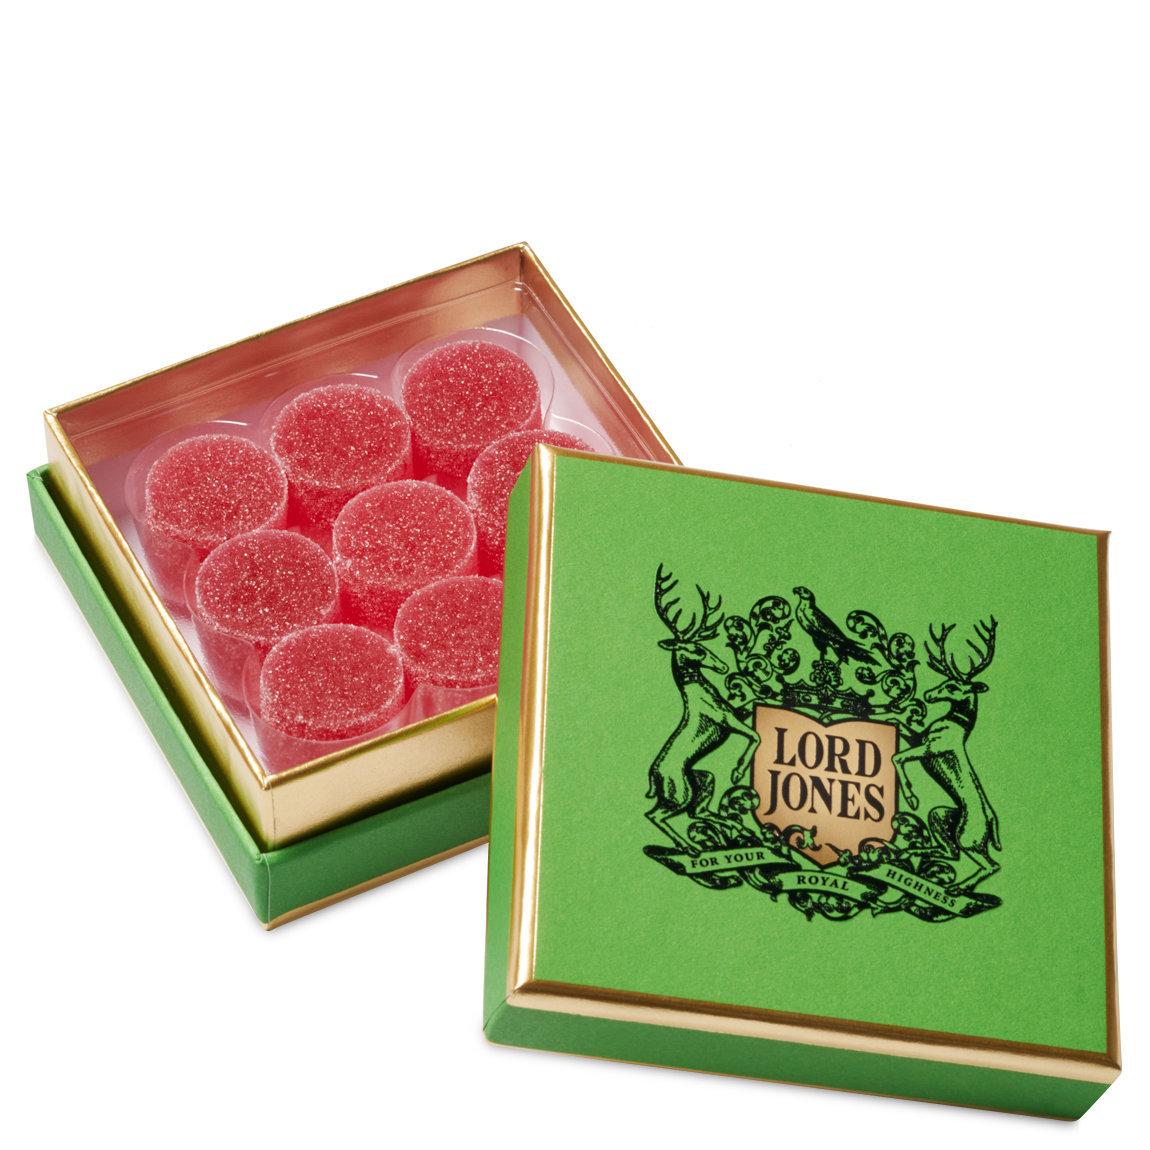 Lord Jones Old Fashioned Hemp-Derived CBD Gumdrops Watermelon alternative view 1 - product swatch.